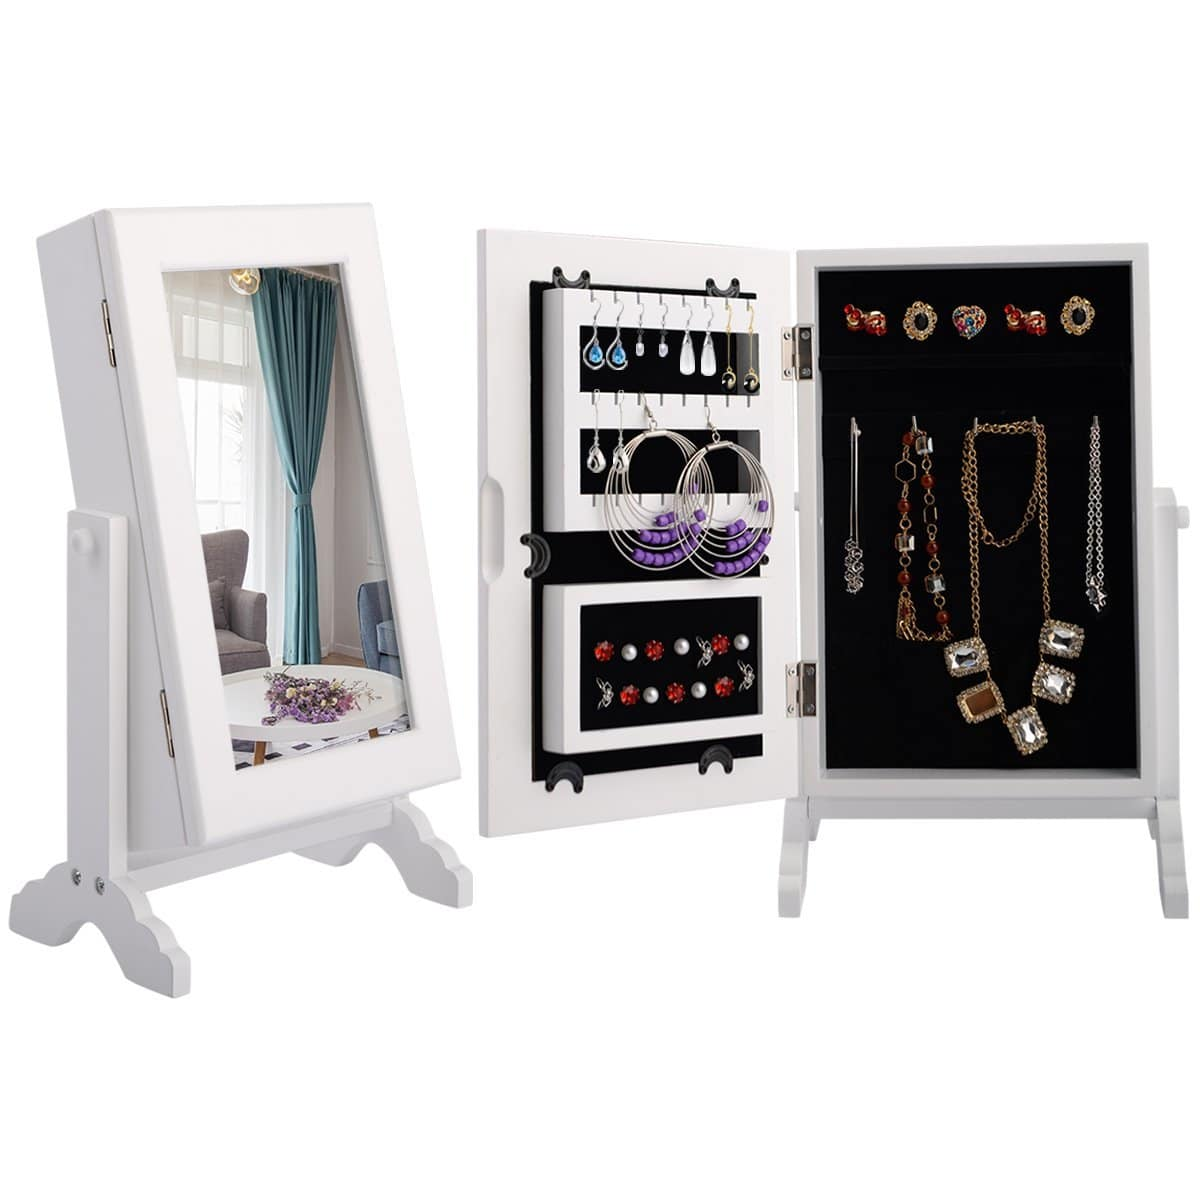 costway schmuckschrank schmuckregal standspiegel spiegelschrank schmuckkasten mit spiegel wei. Black Bedroom Furniture Sets. Home Design Ideas